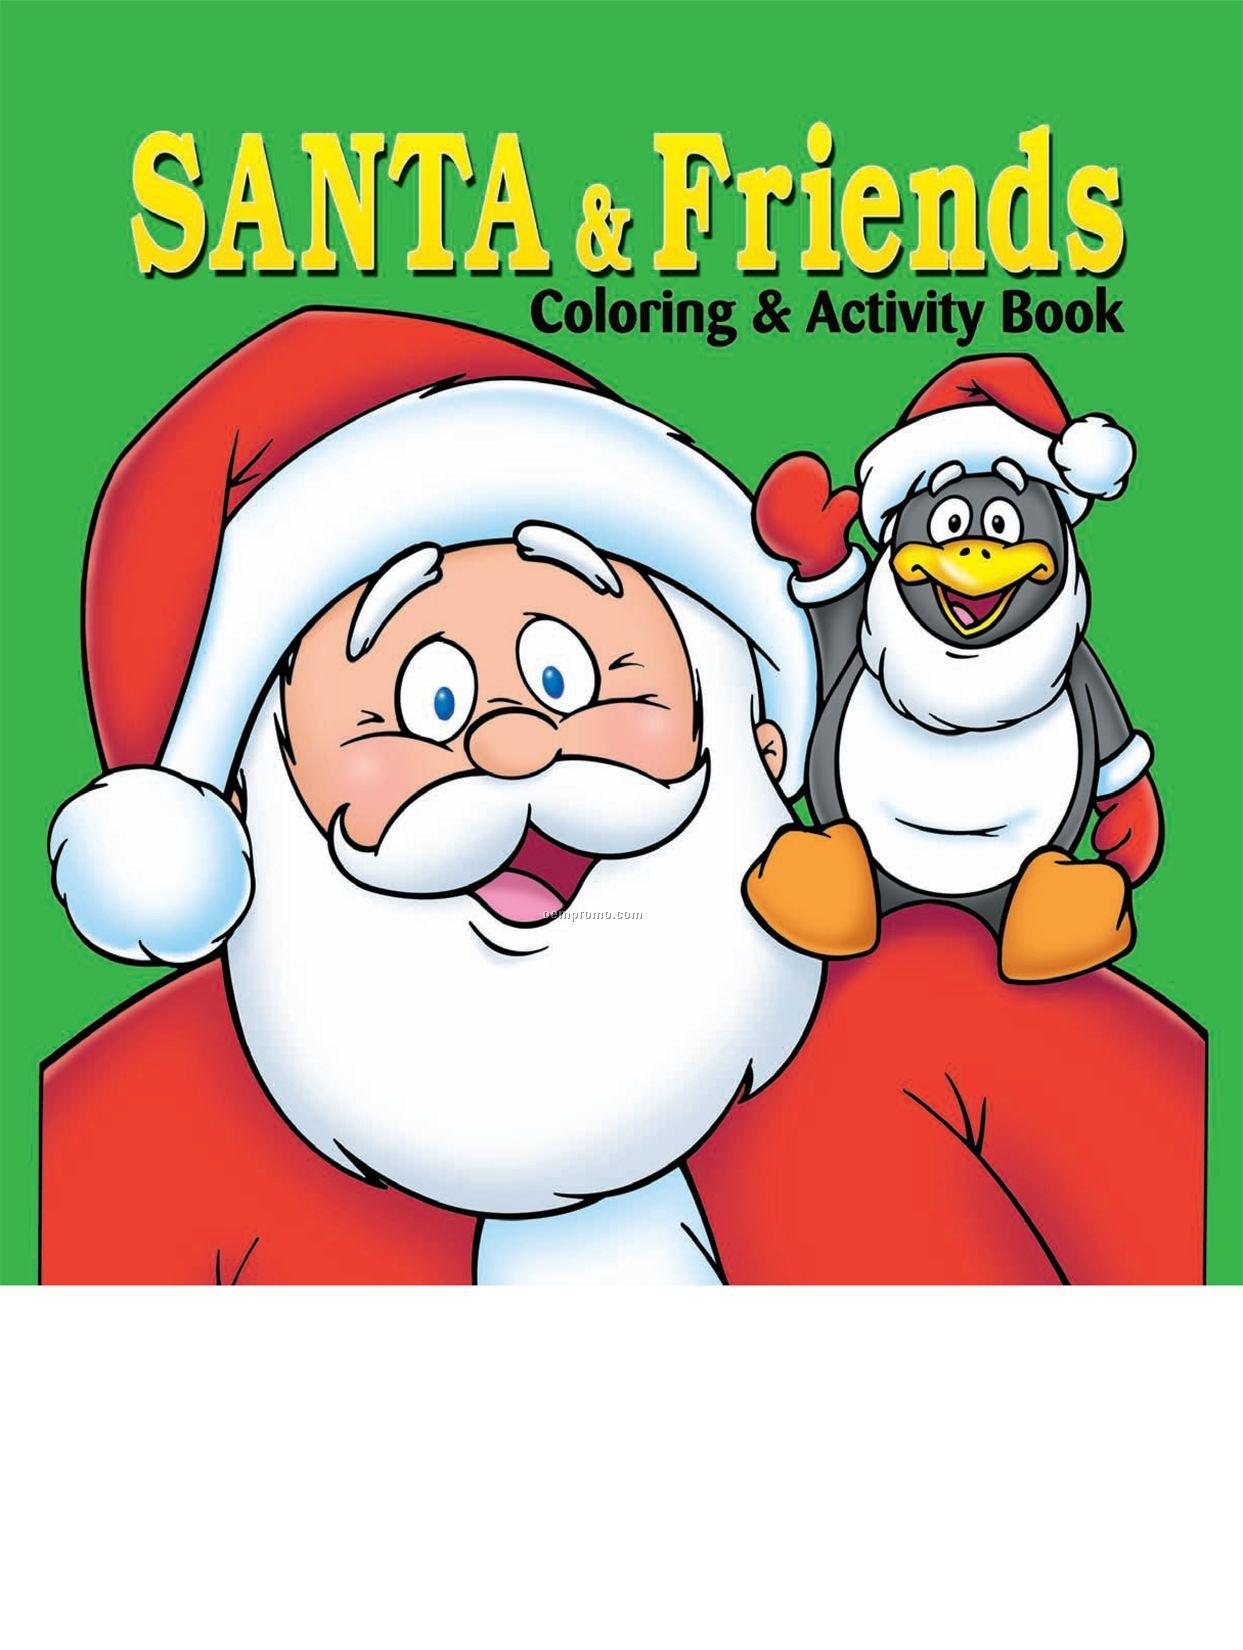 Santa & Friends Coloring Book